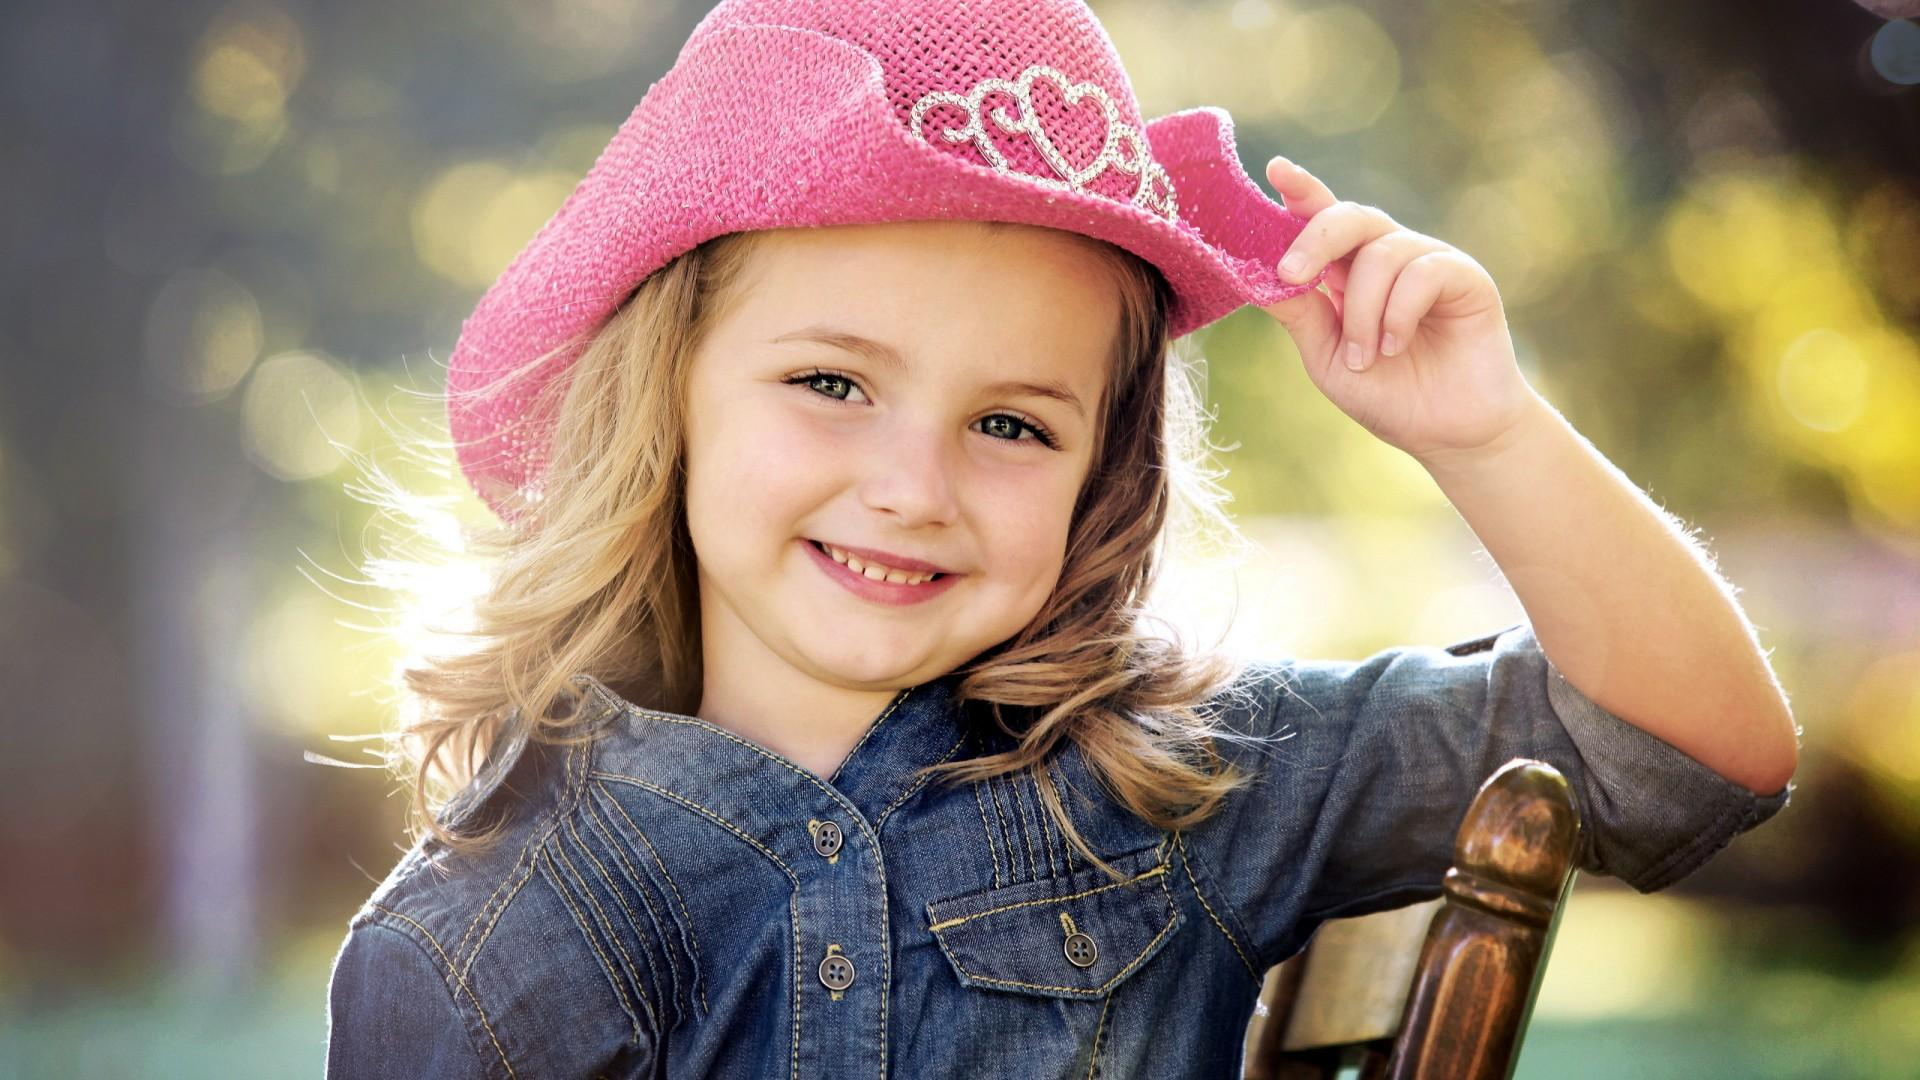 Wallpaper Of Cute Baby Girl